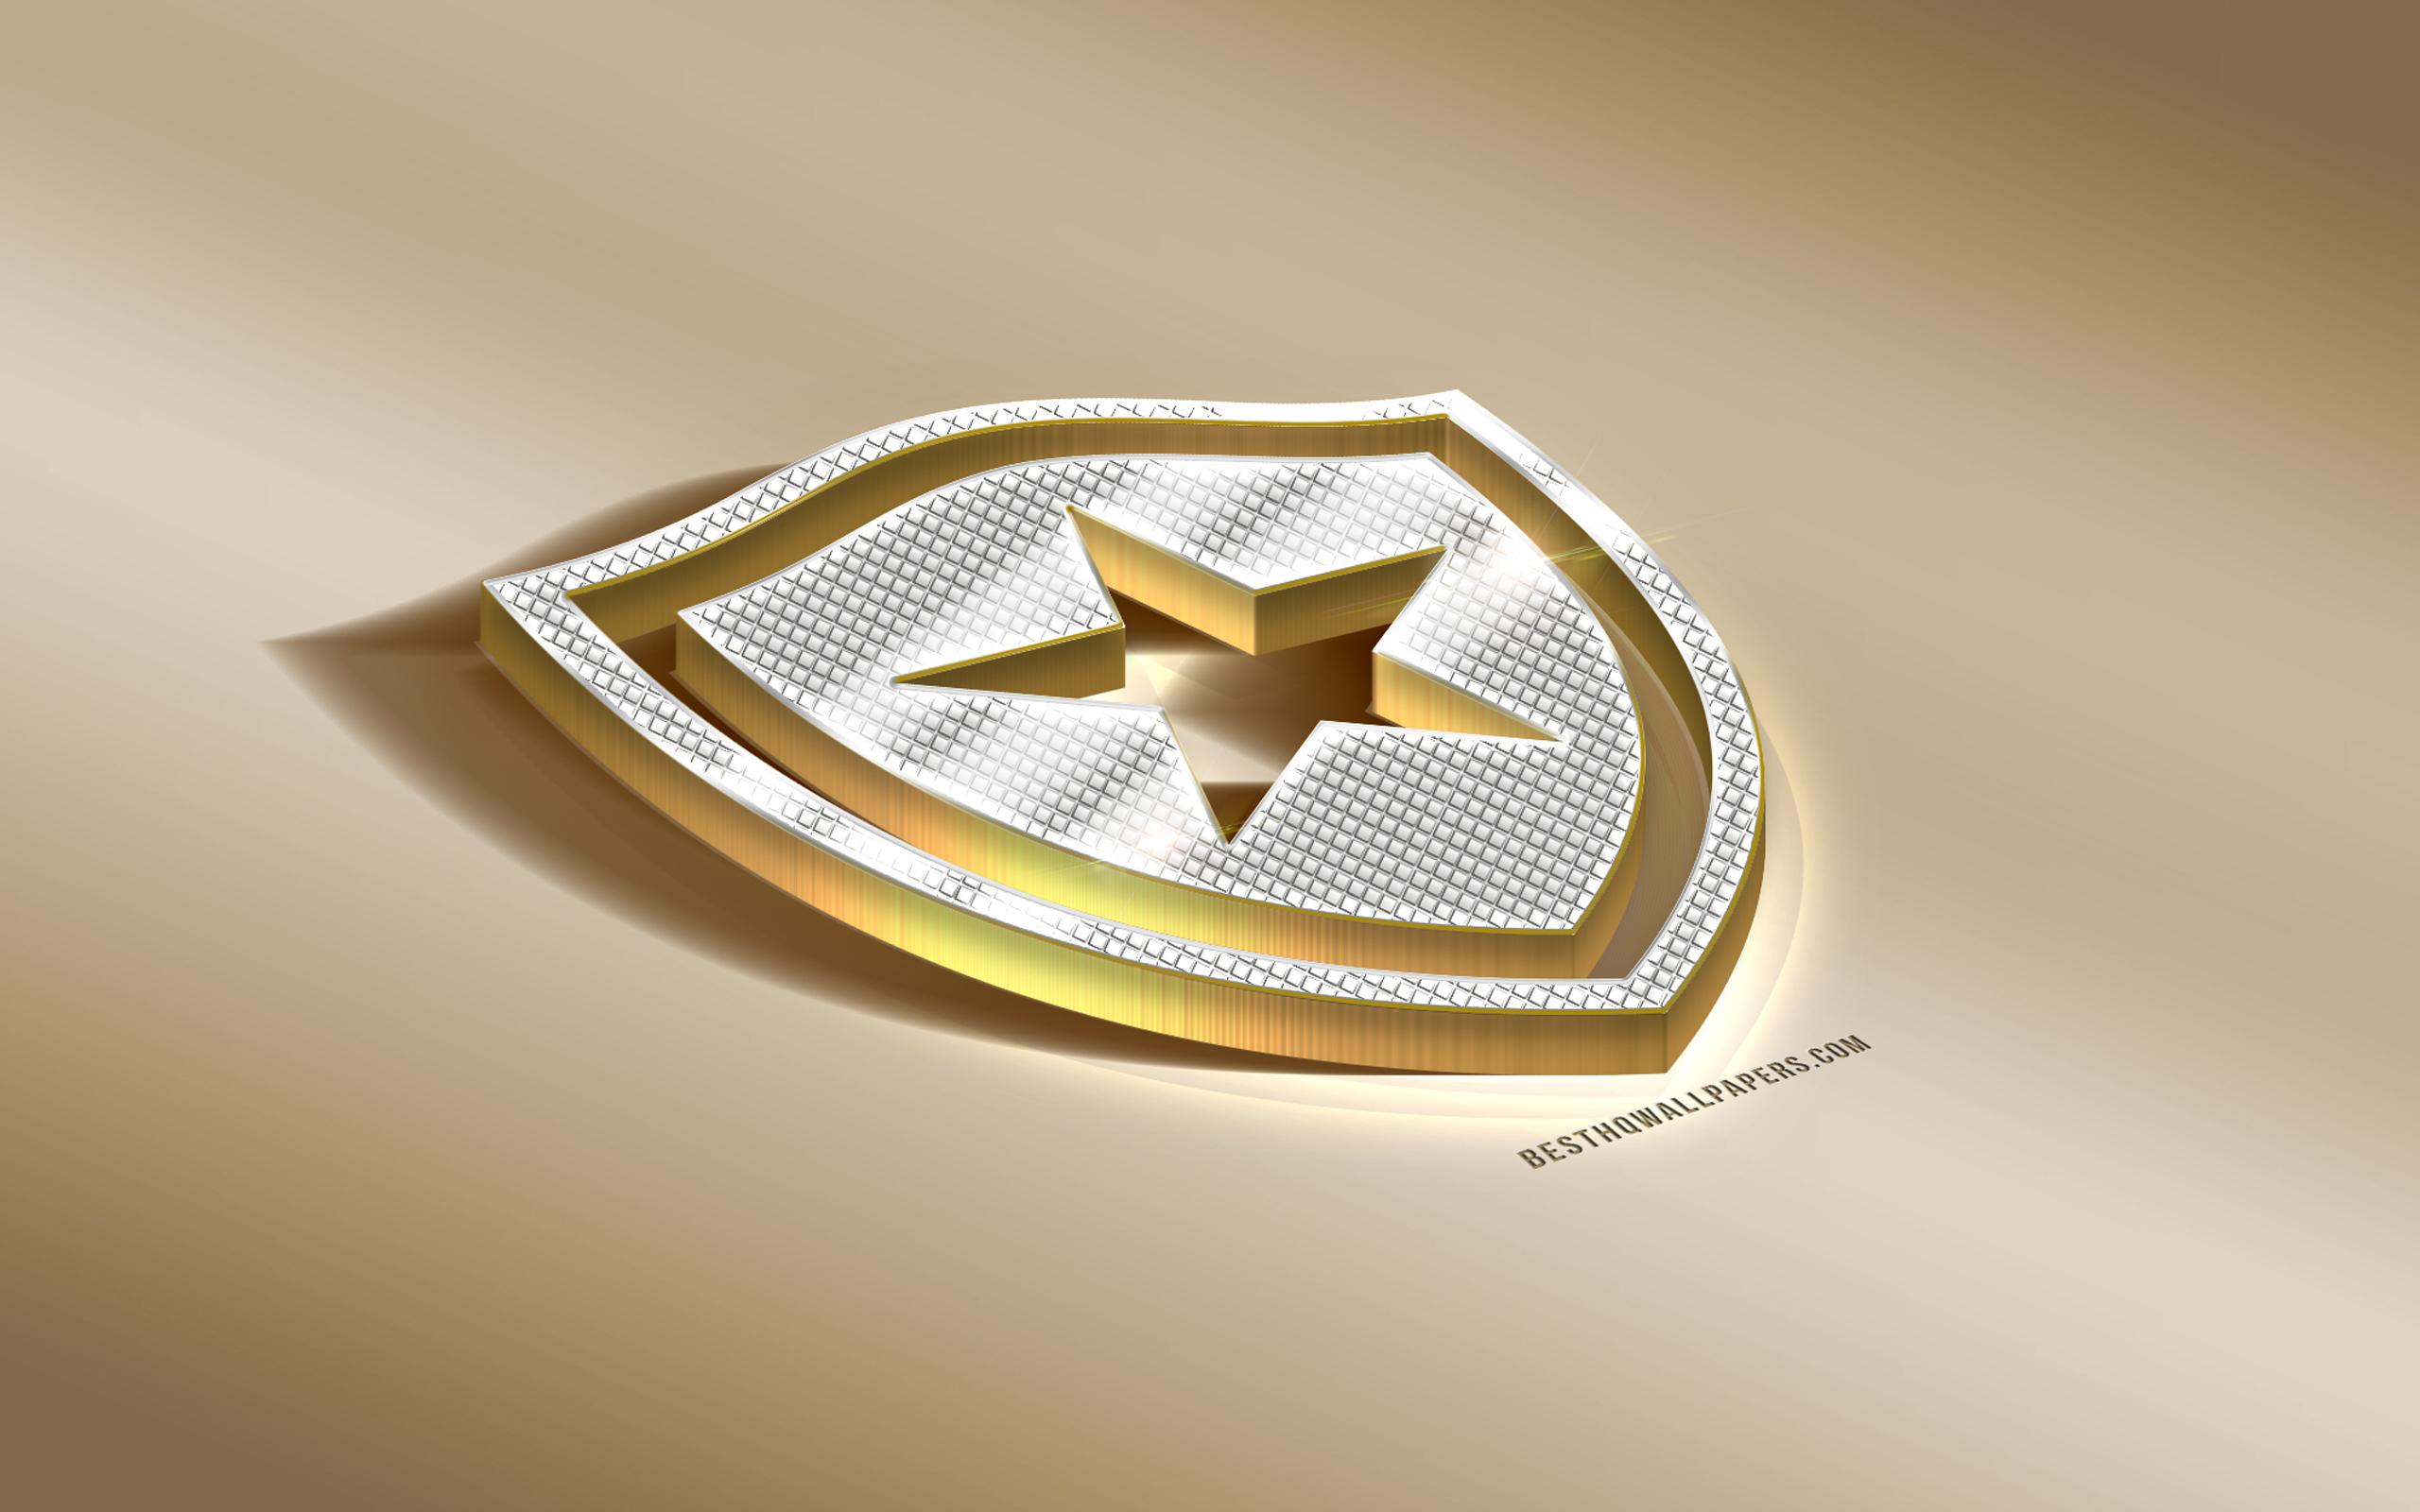 Download wallpapers Botafogo Brazilian football club golden logo 2560x1600